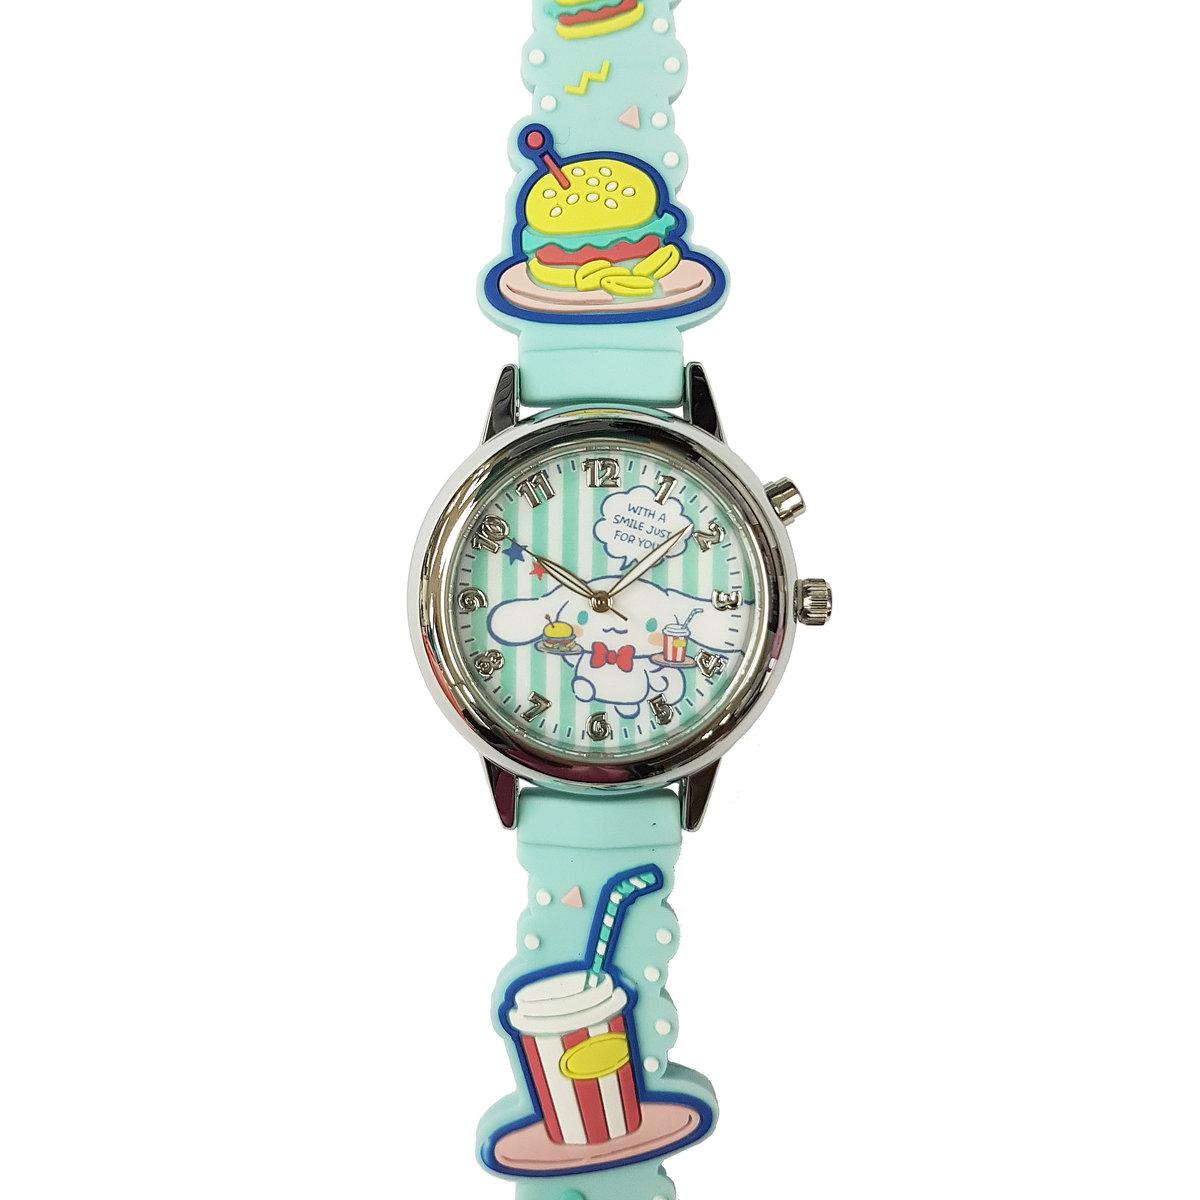 SANRIO - Cinnamoroll light up quartz watch (Light blue)